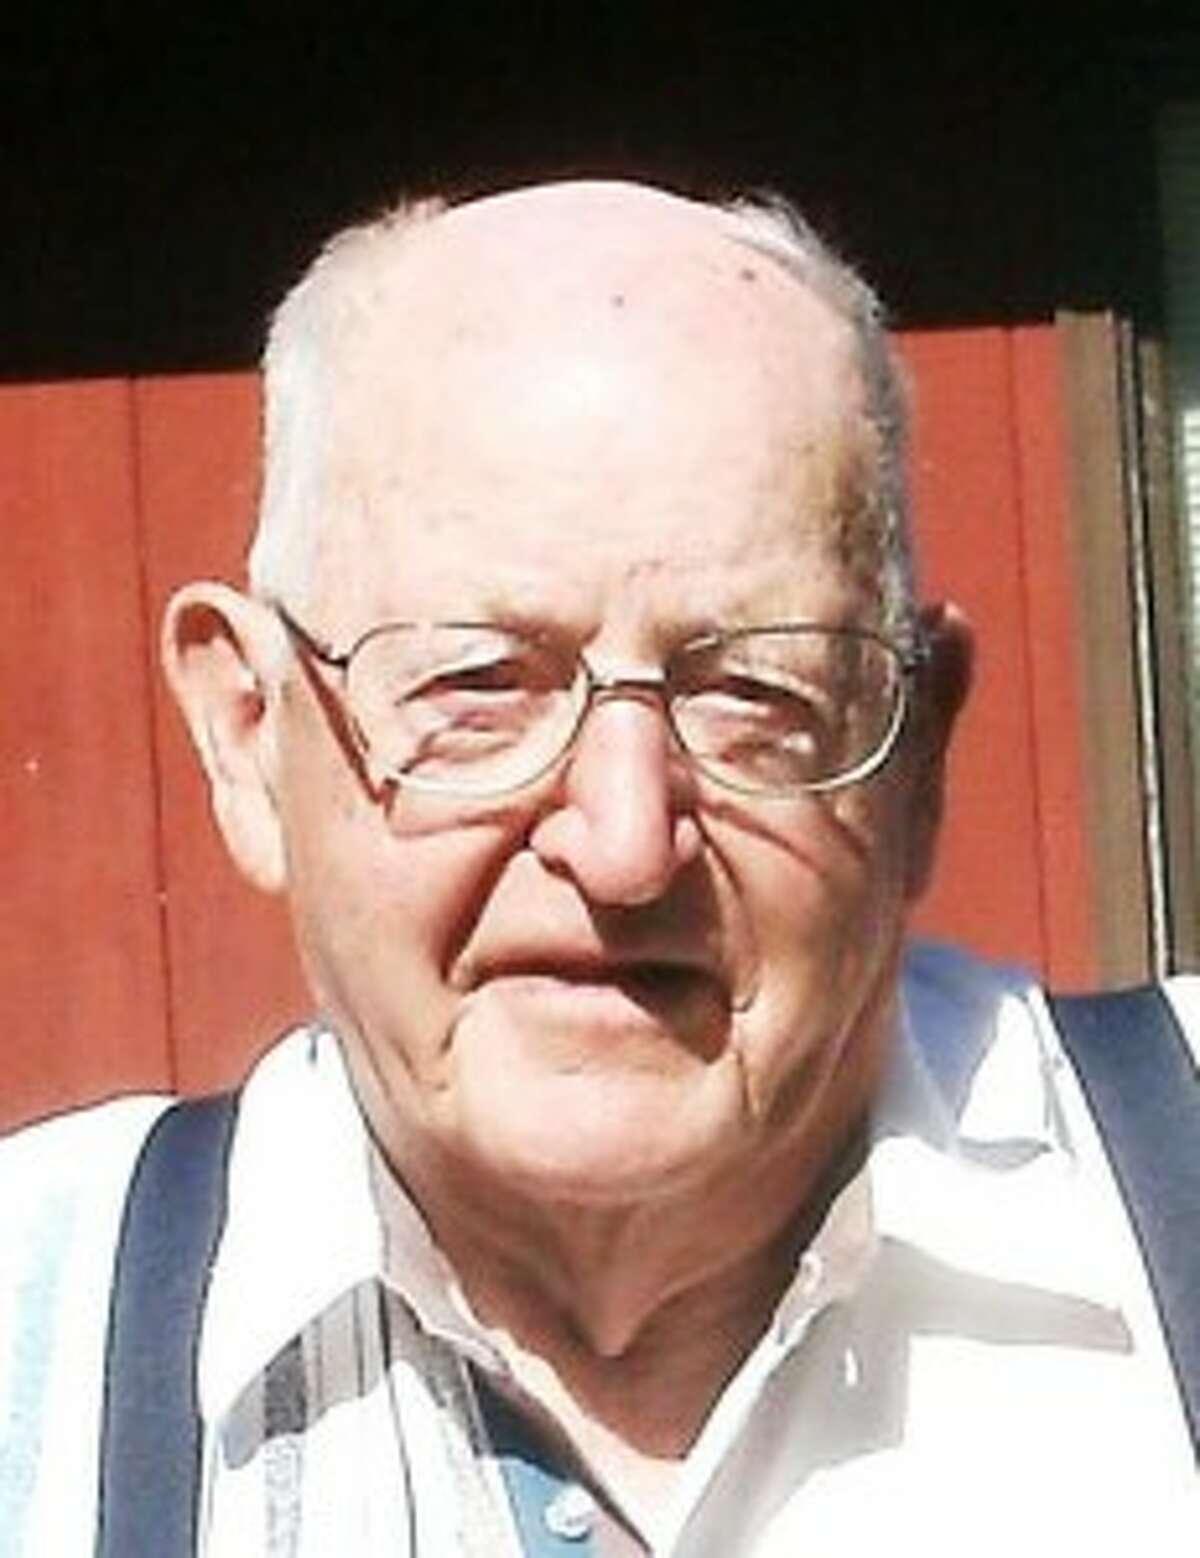 Ralph Hinkley